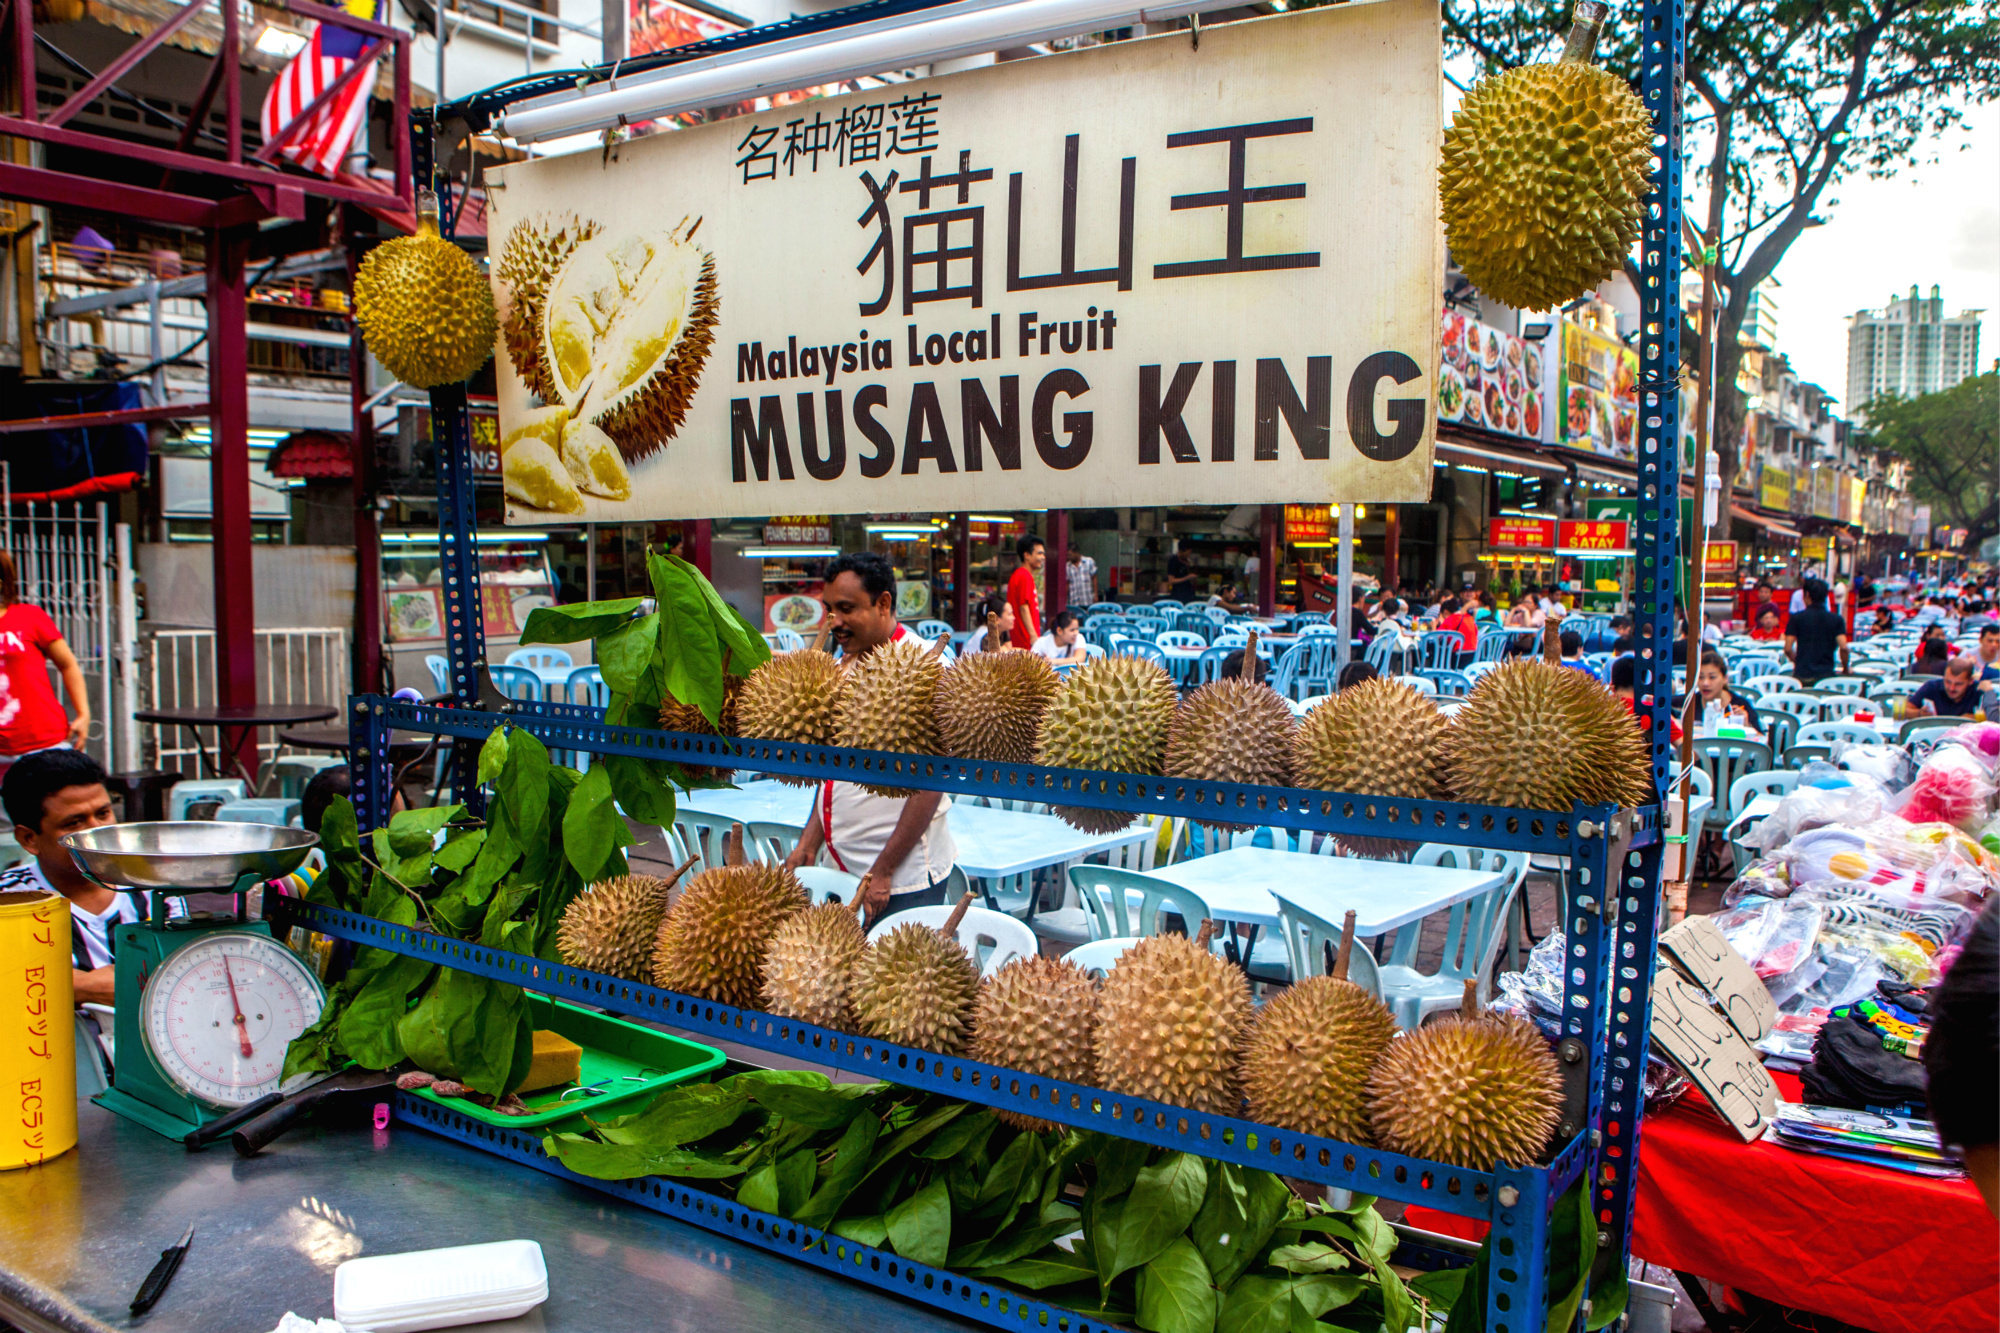 musang king, Malaysia